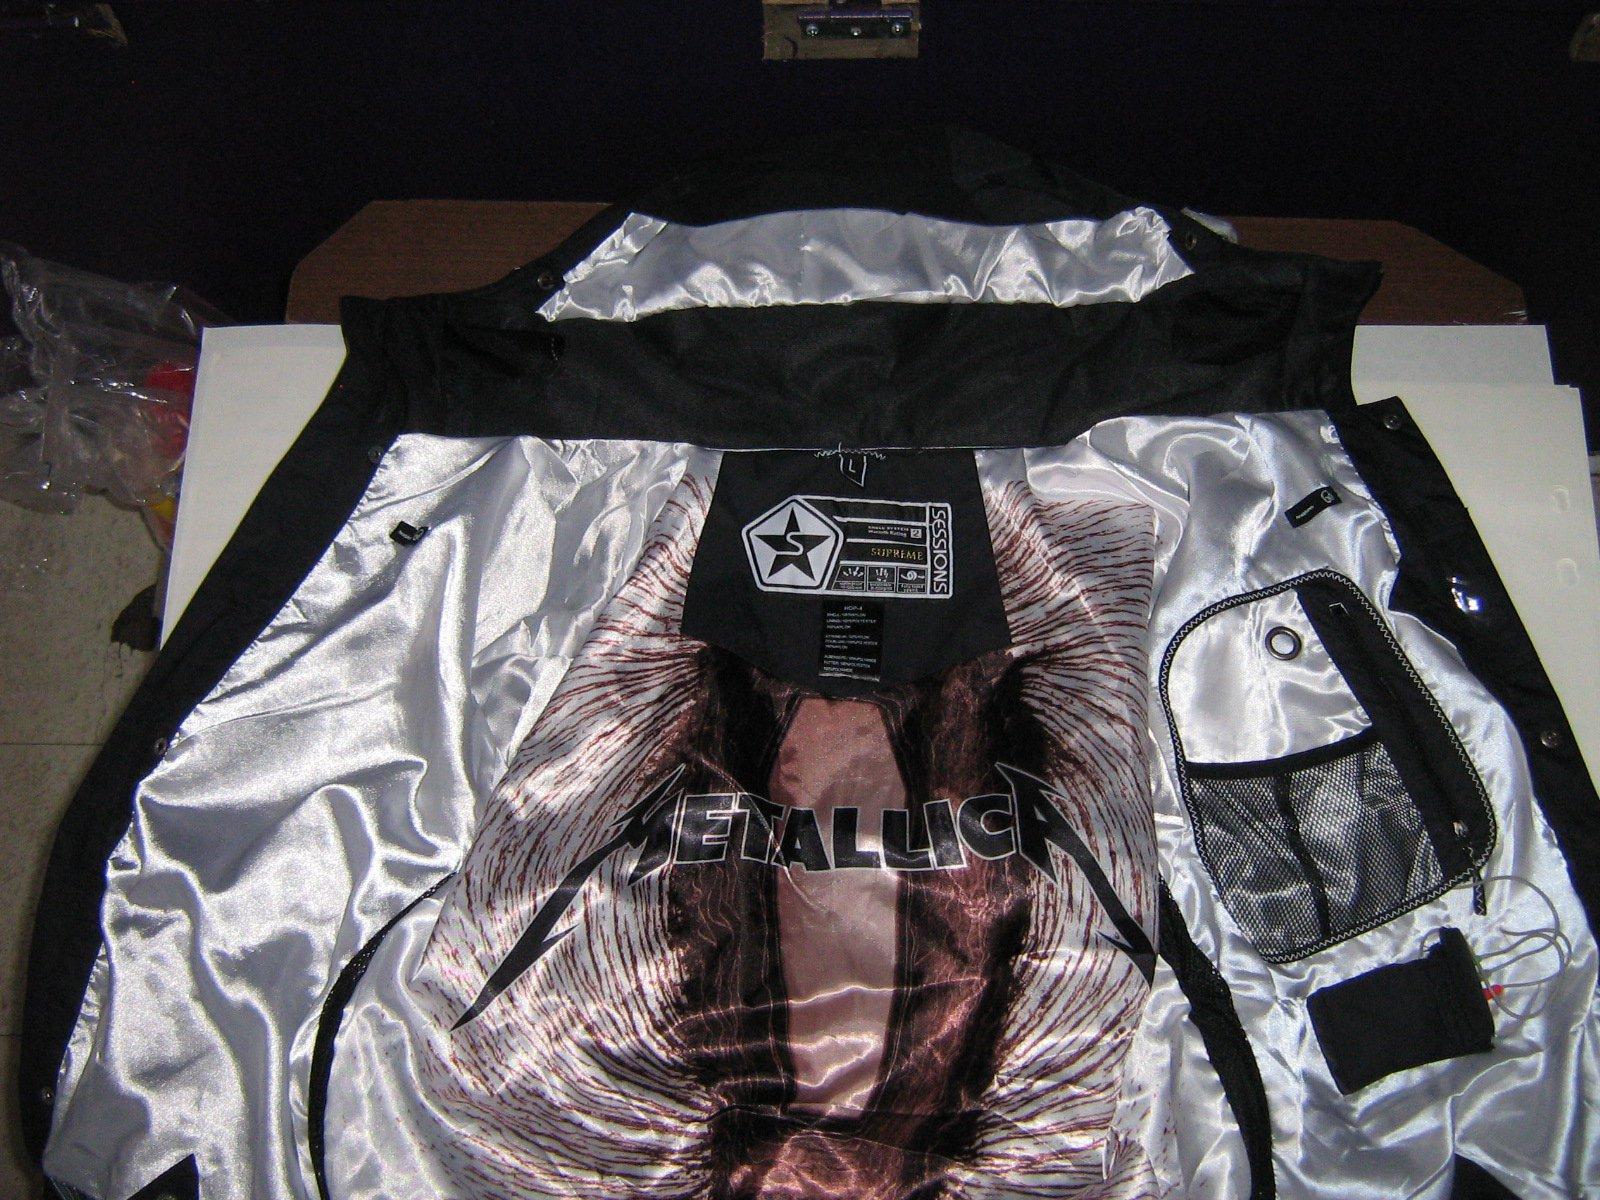 Jacket inside